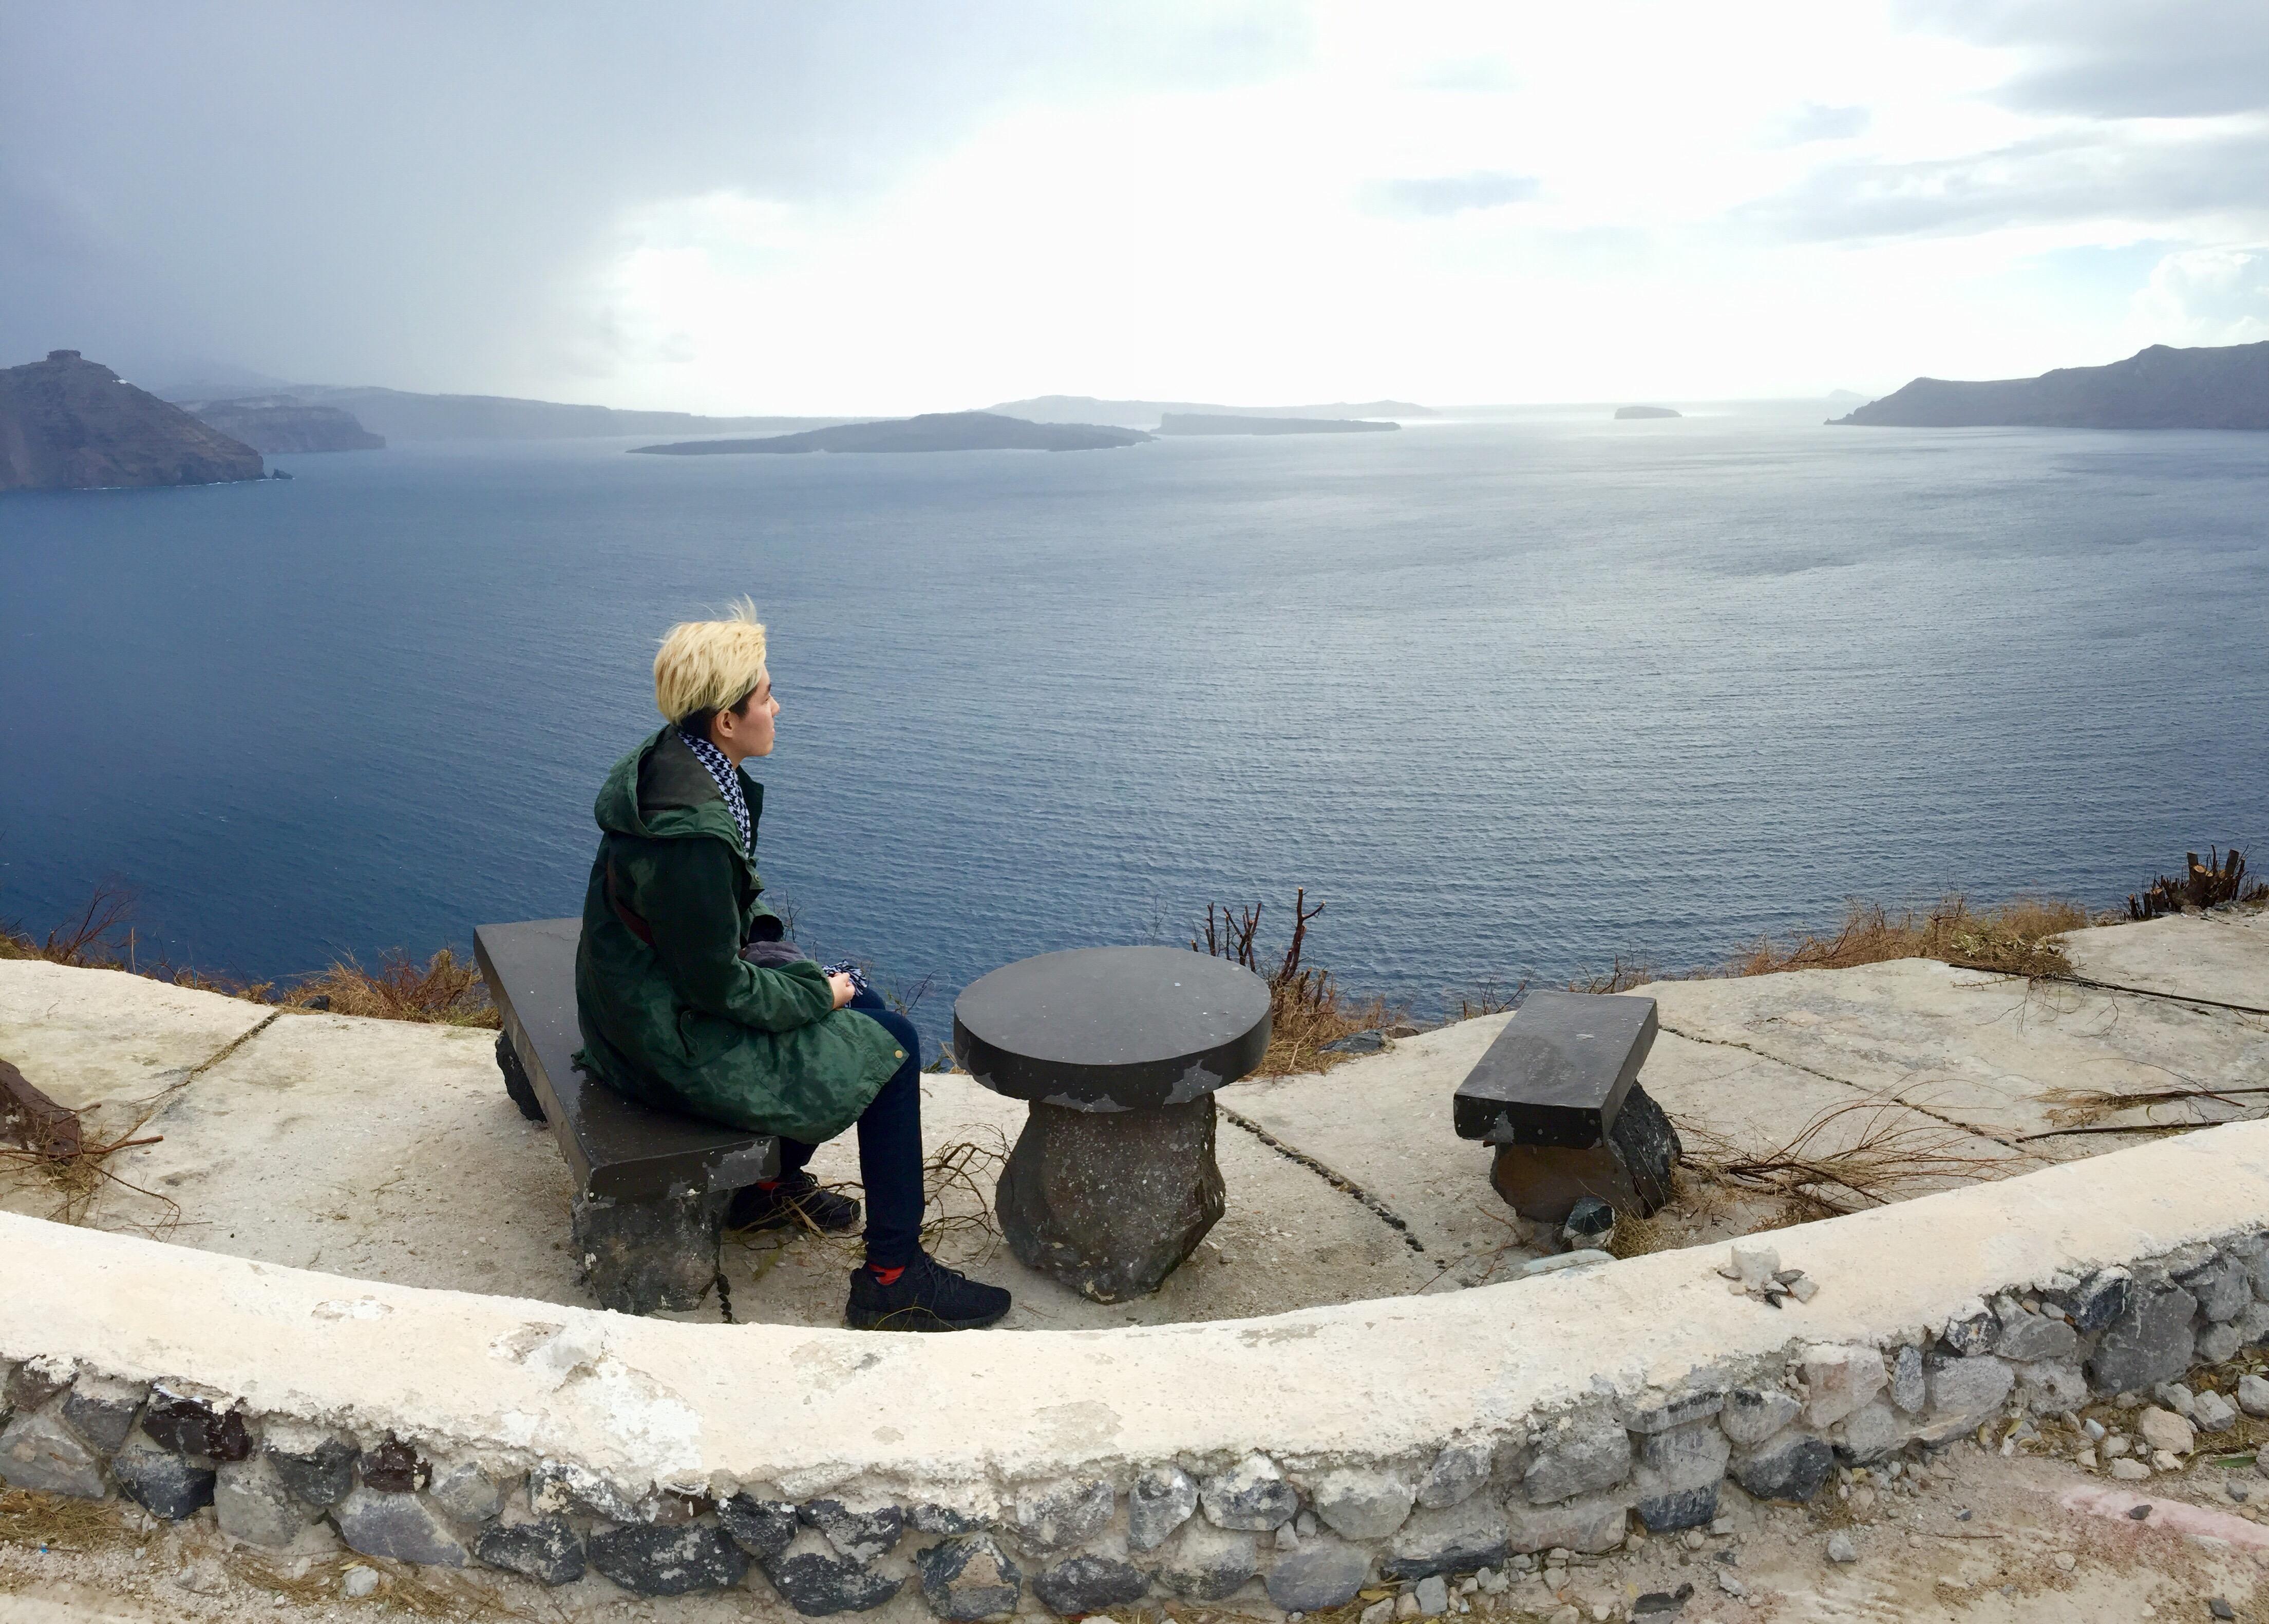 November Winter in Santorini – owned the island! – Wander Baz